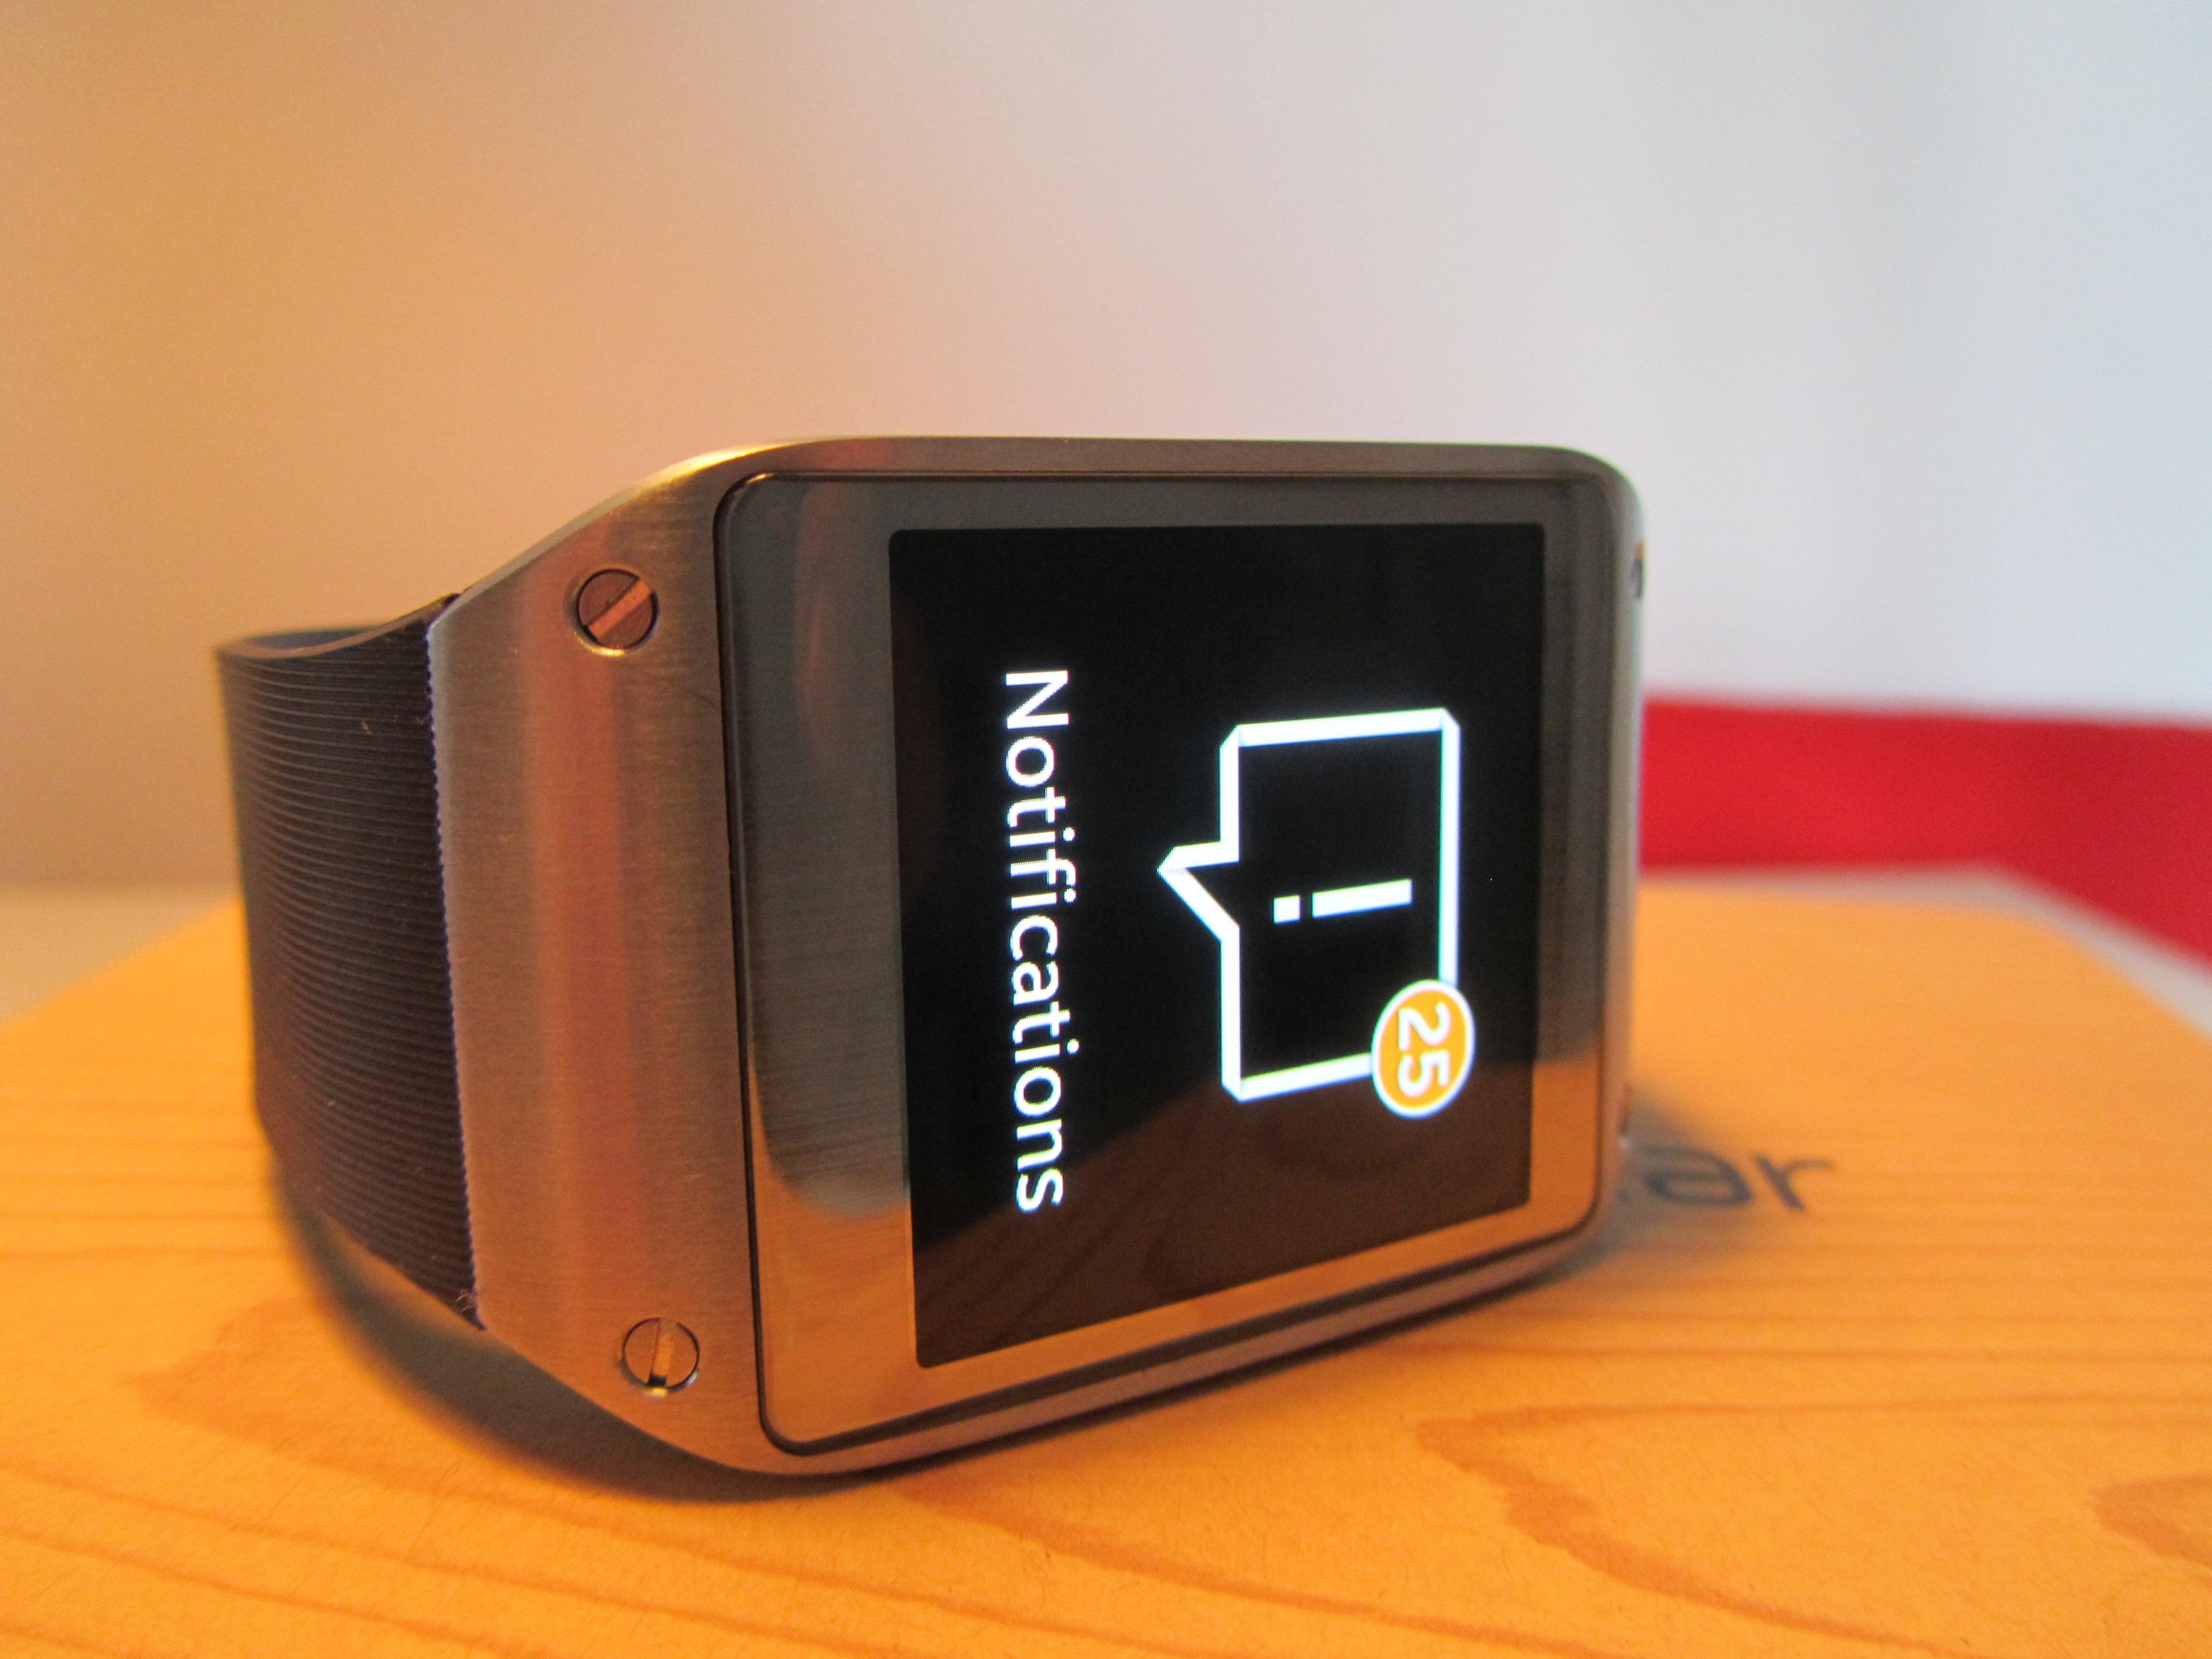 Samsung Galaxy Gear Review: a $299 Smartwatch That Can't Send an